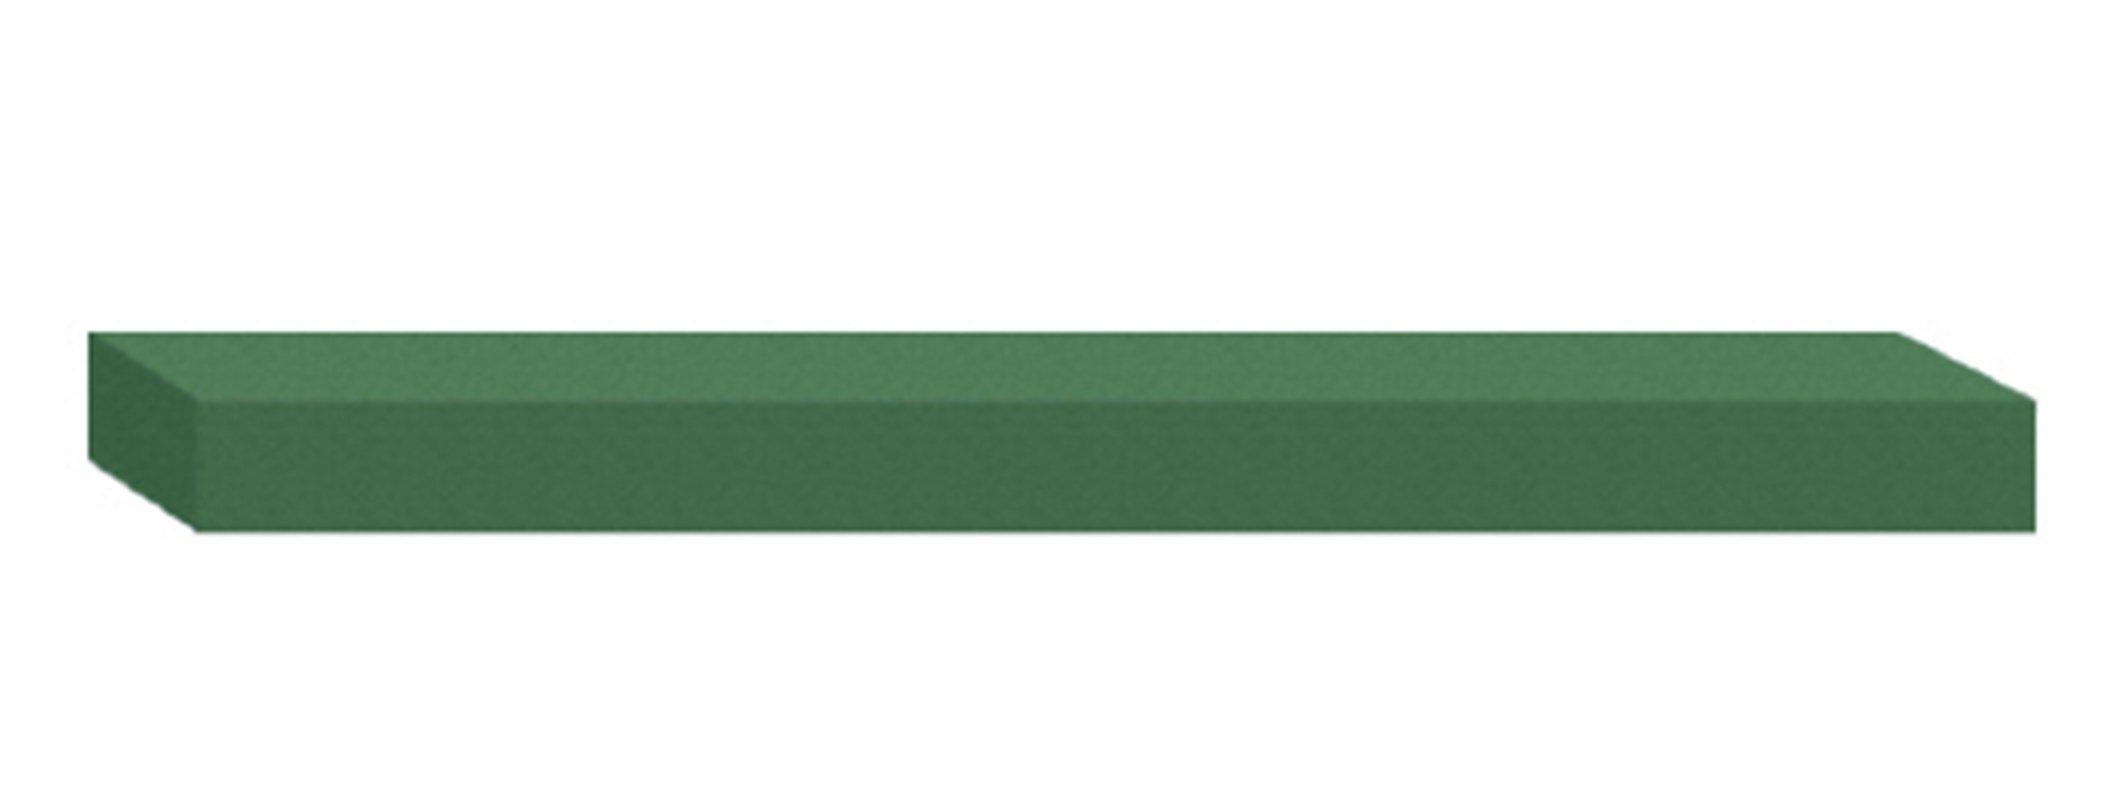 Dedeco 0208 Rubberized Abrasive Block/Stick, Silicon Carbide, Medium, 6'' x 1'' x 1/4'', Green